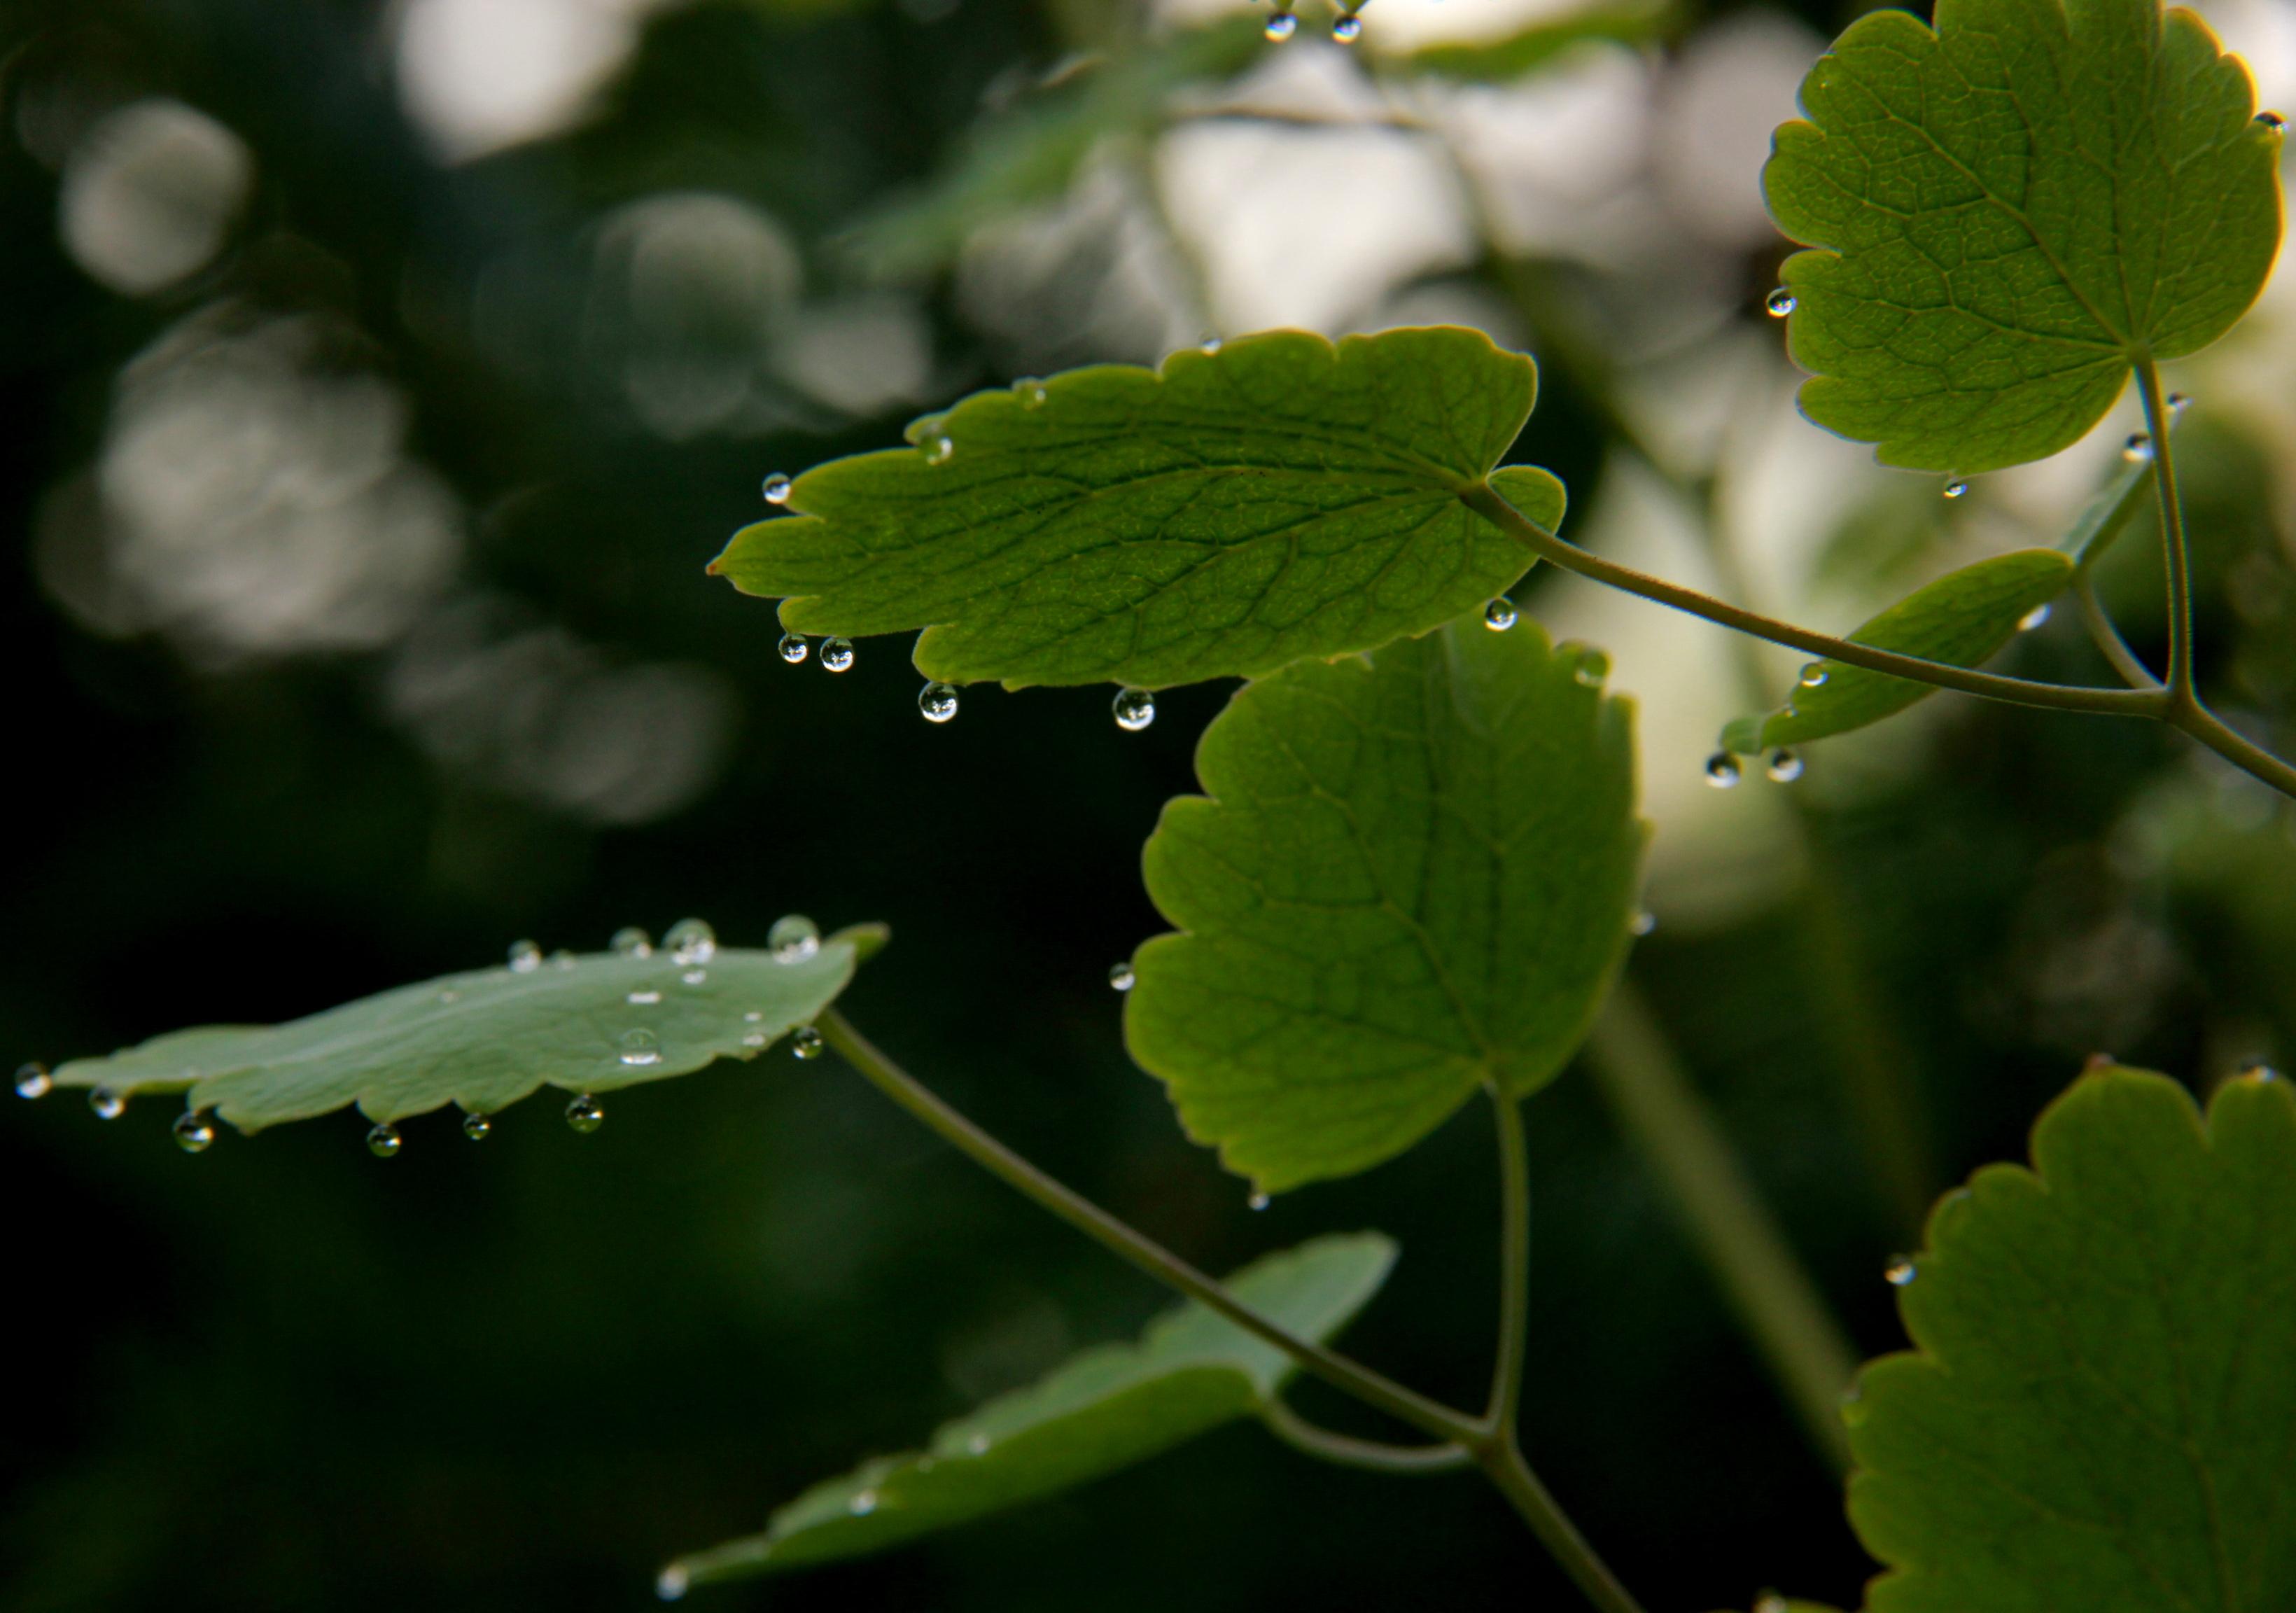 In spite of the rain